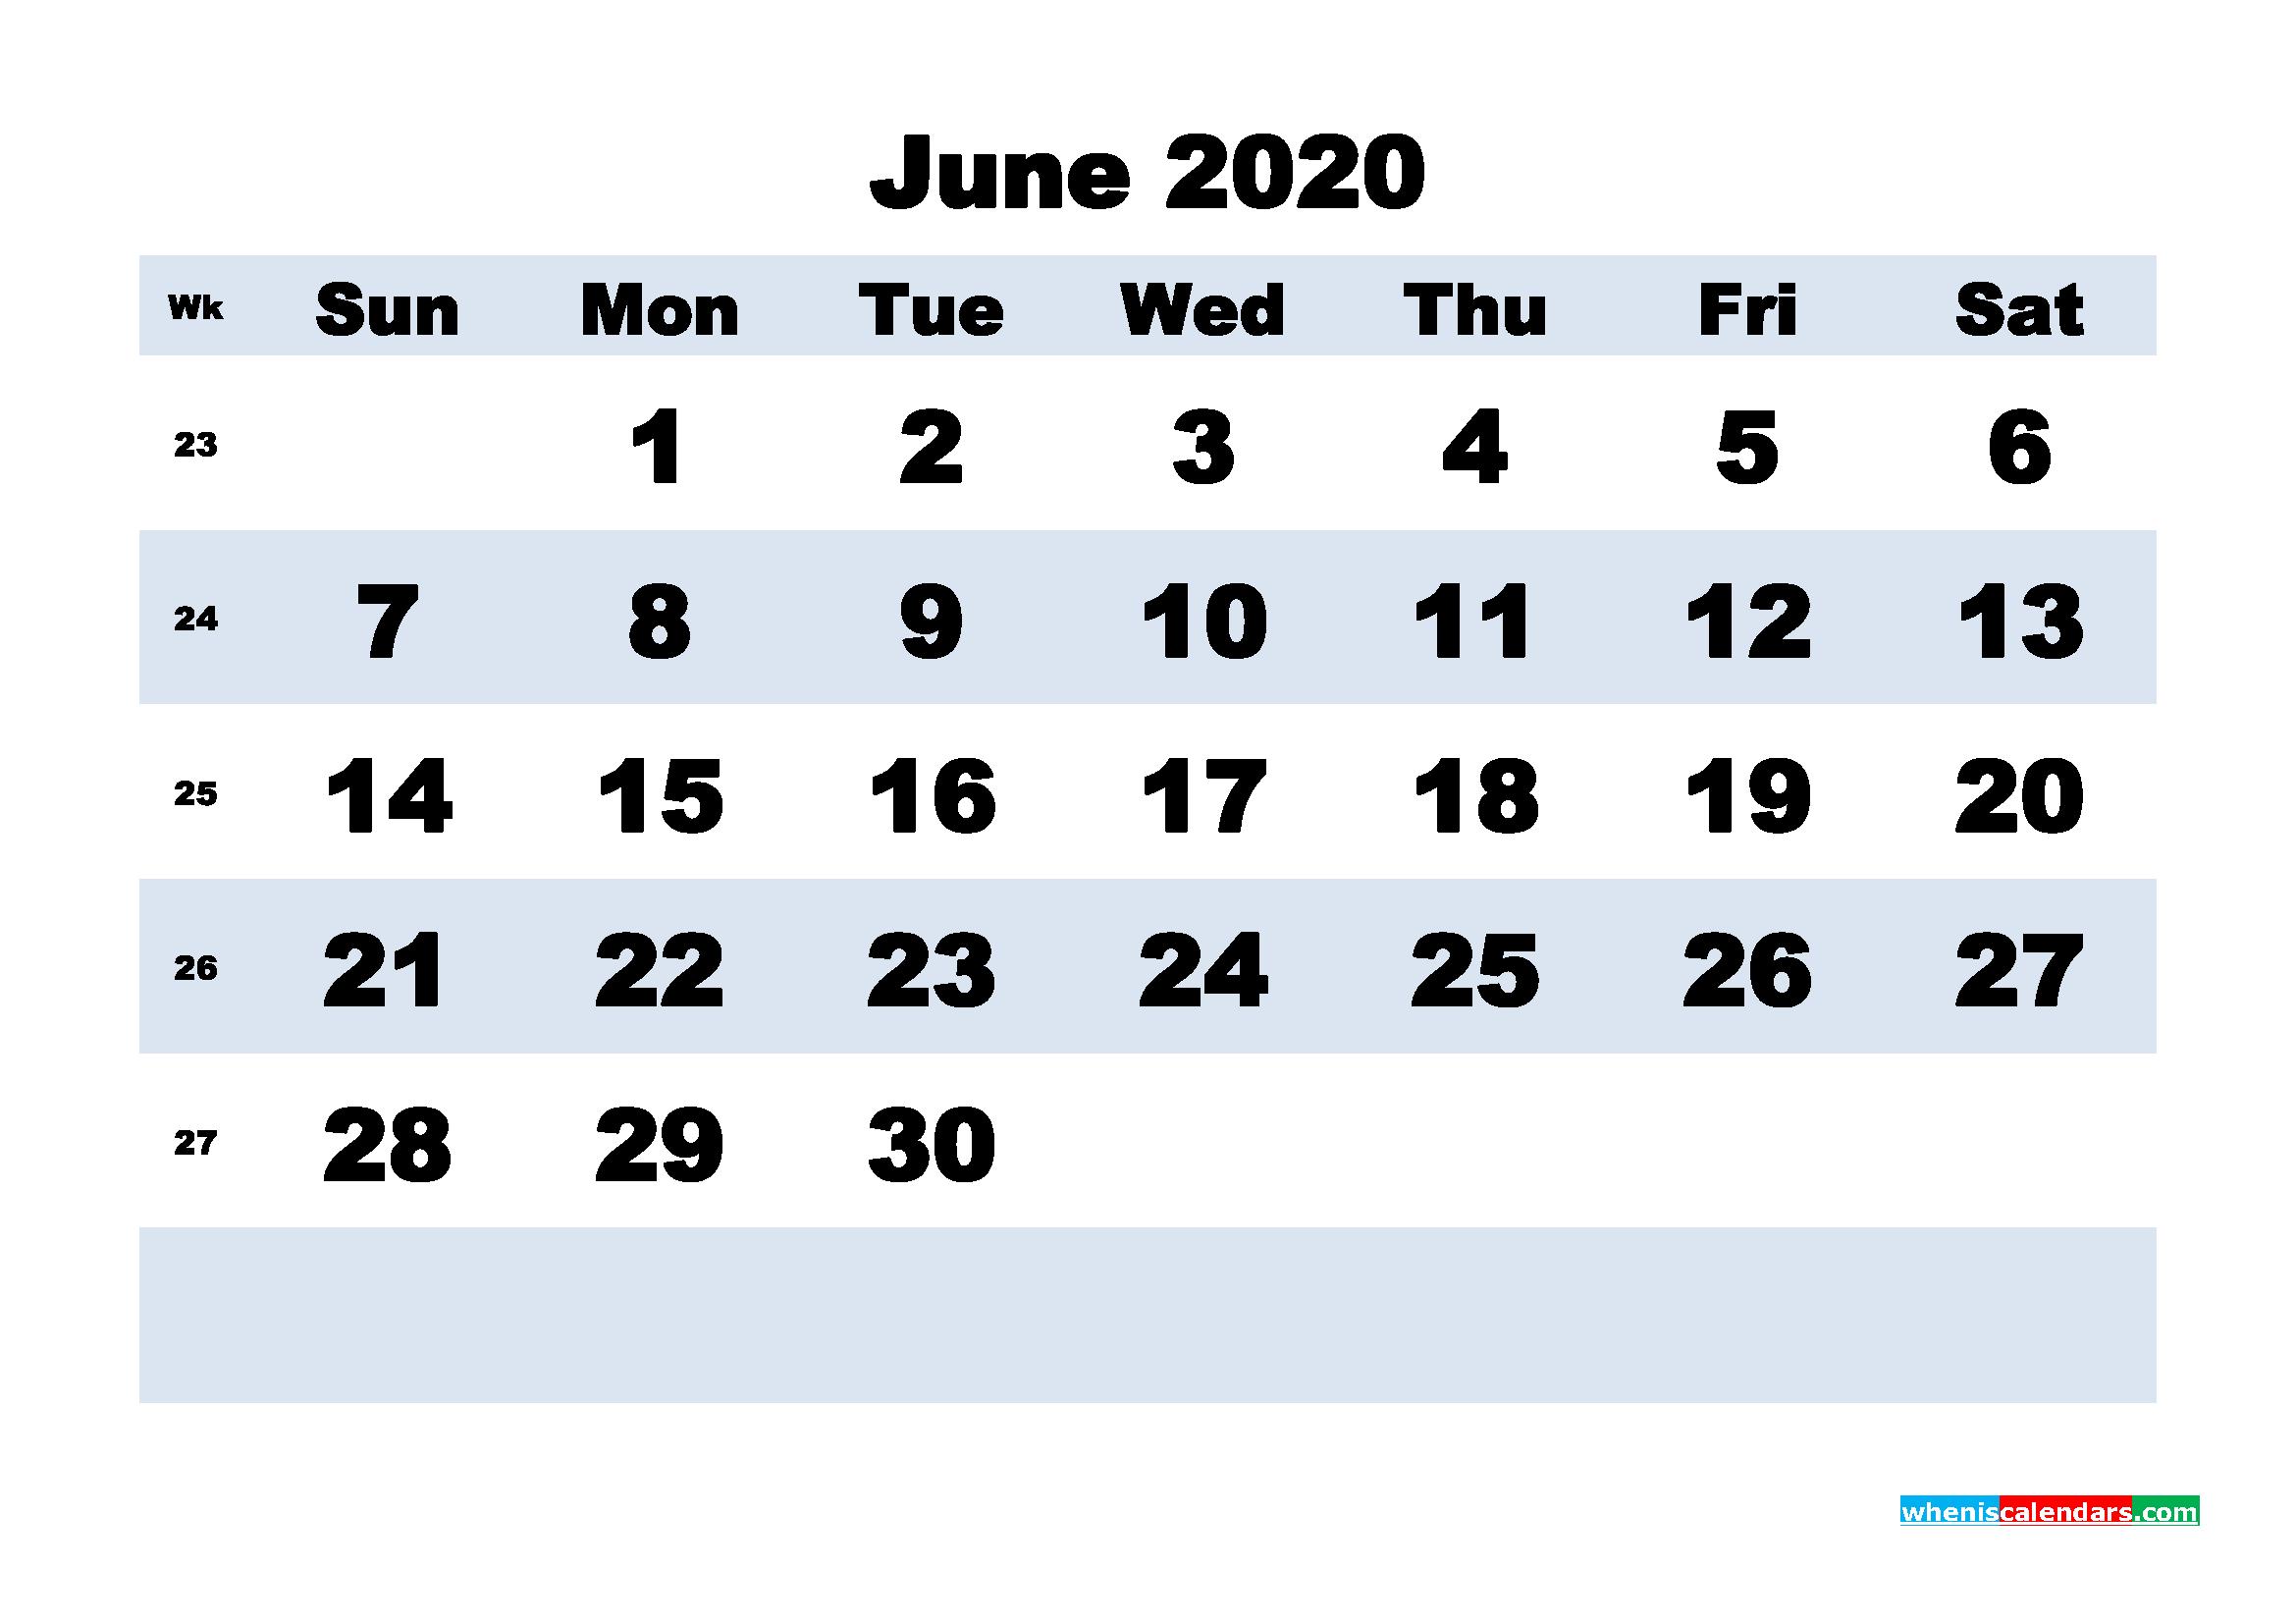 June Printable Calendar 2020 PDF, Word - No.m20b162